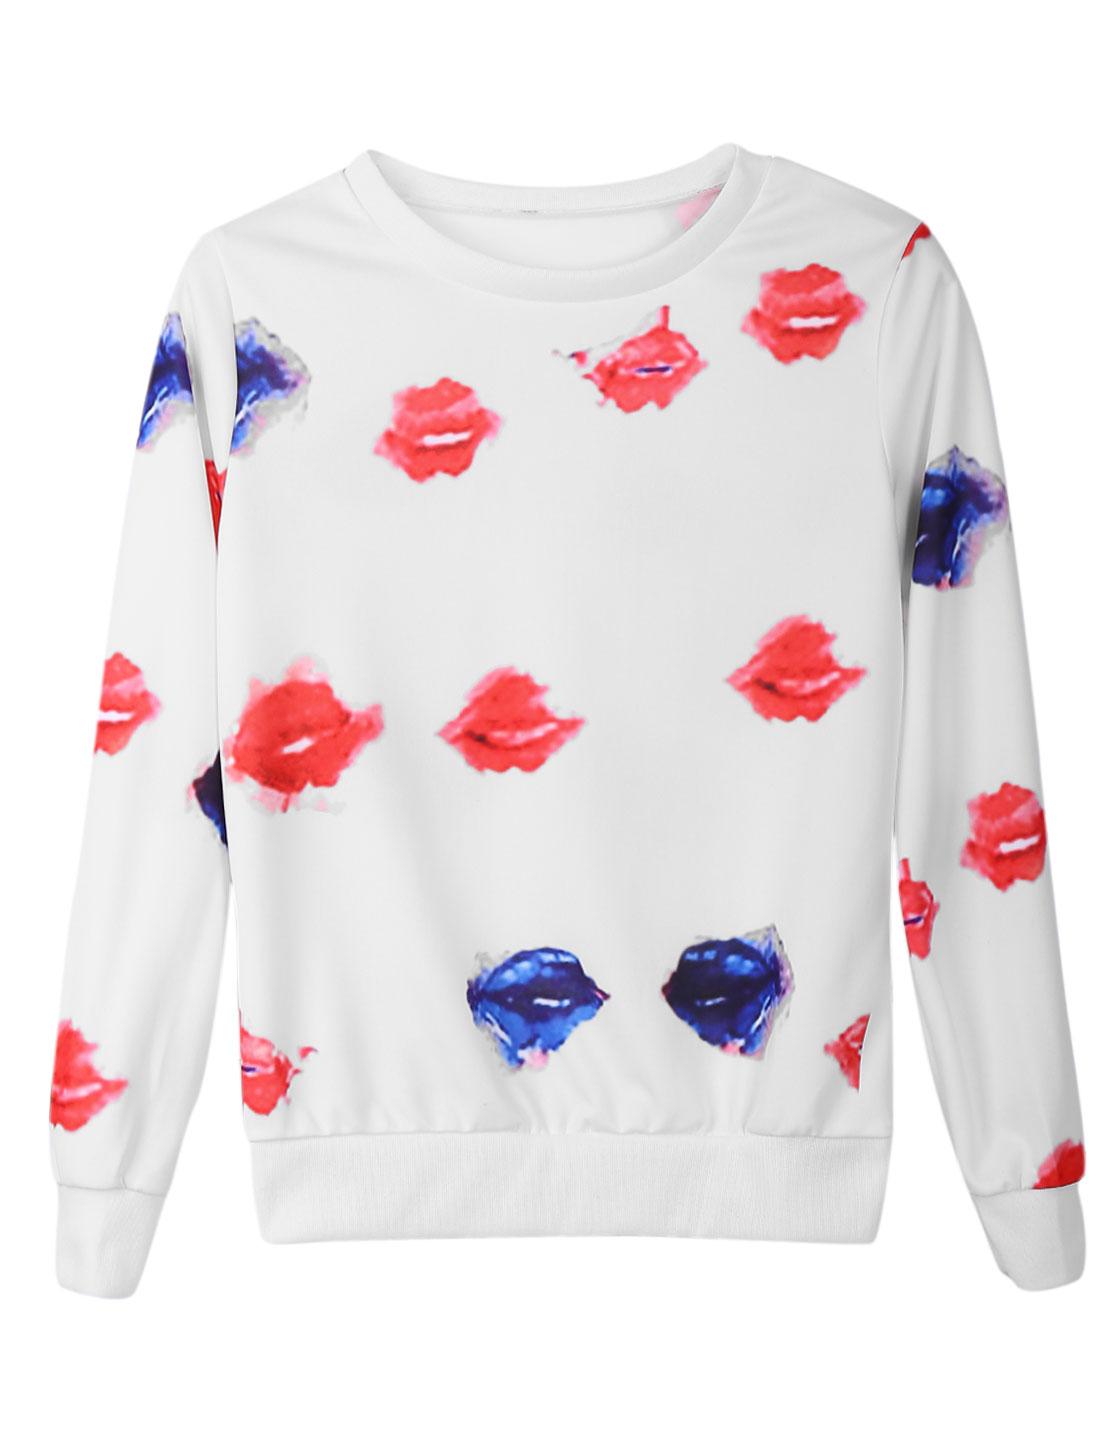 Women Round Neck Long Sleeves Lips Pattern Pullover Stylish T-Shirt White XS